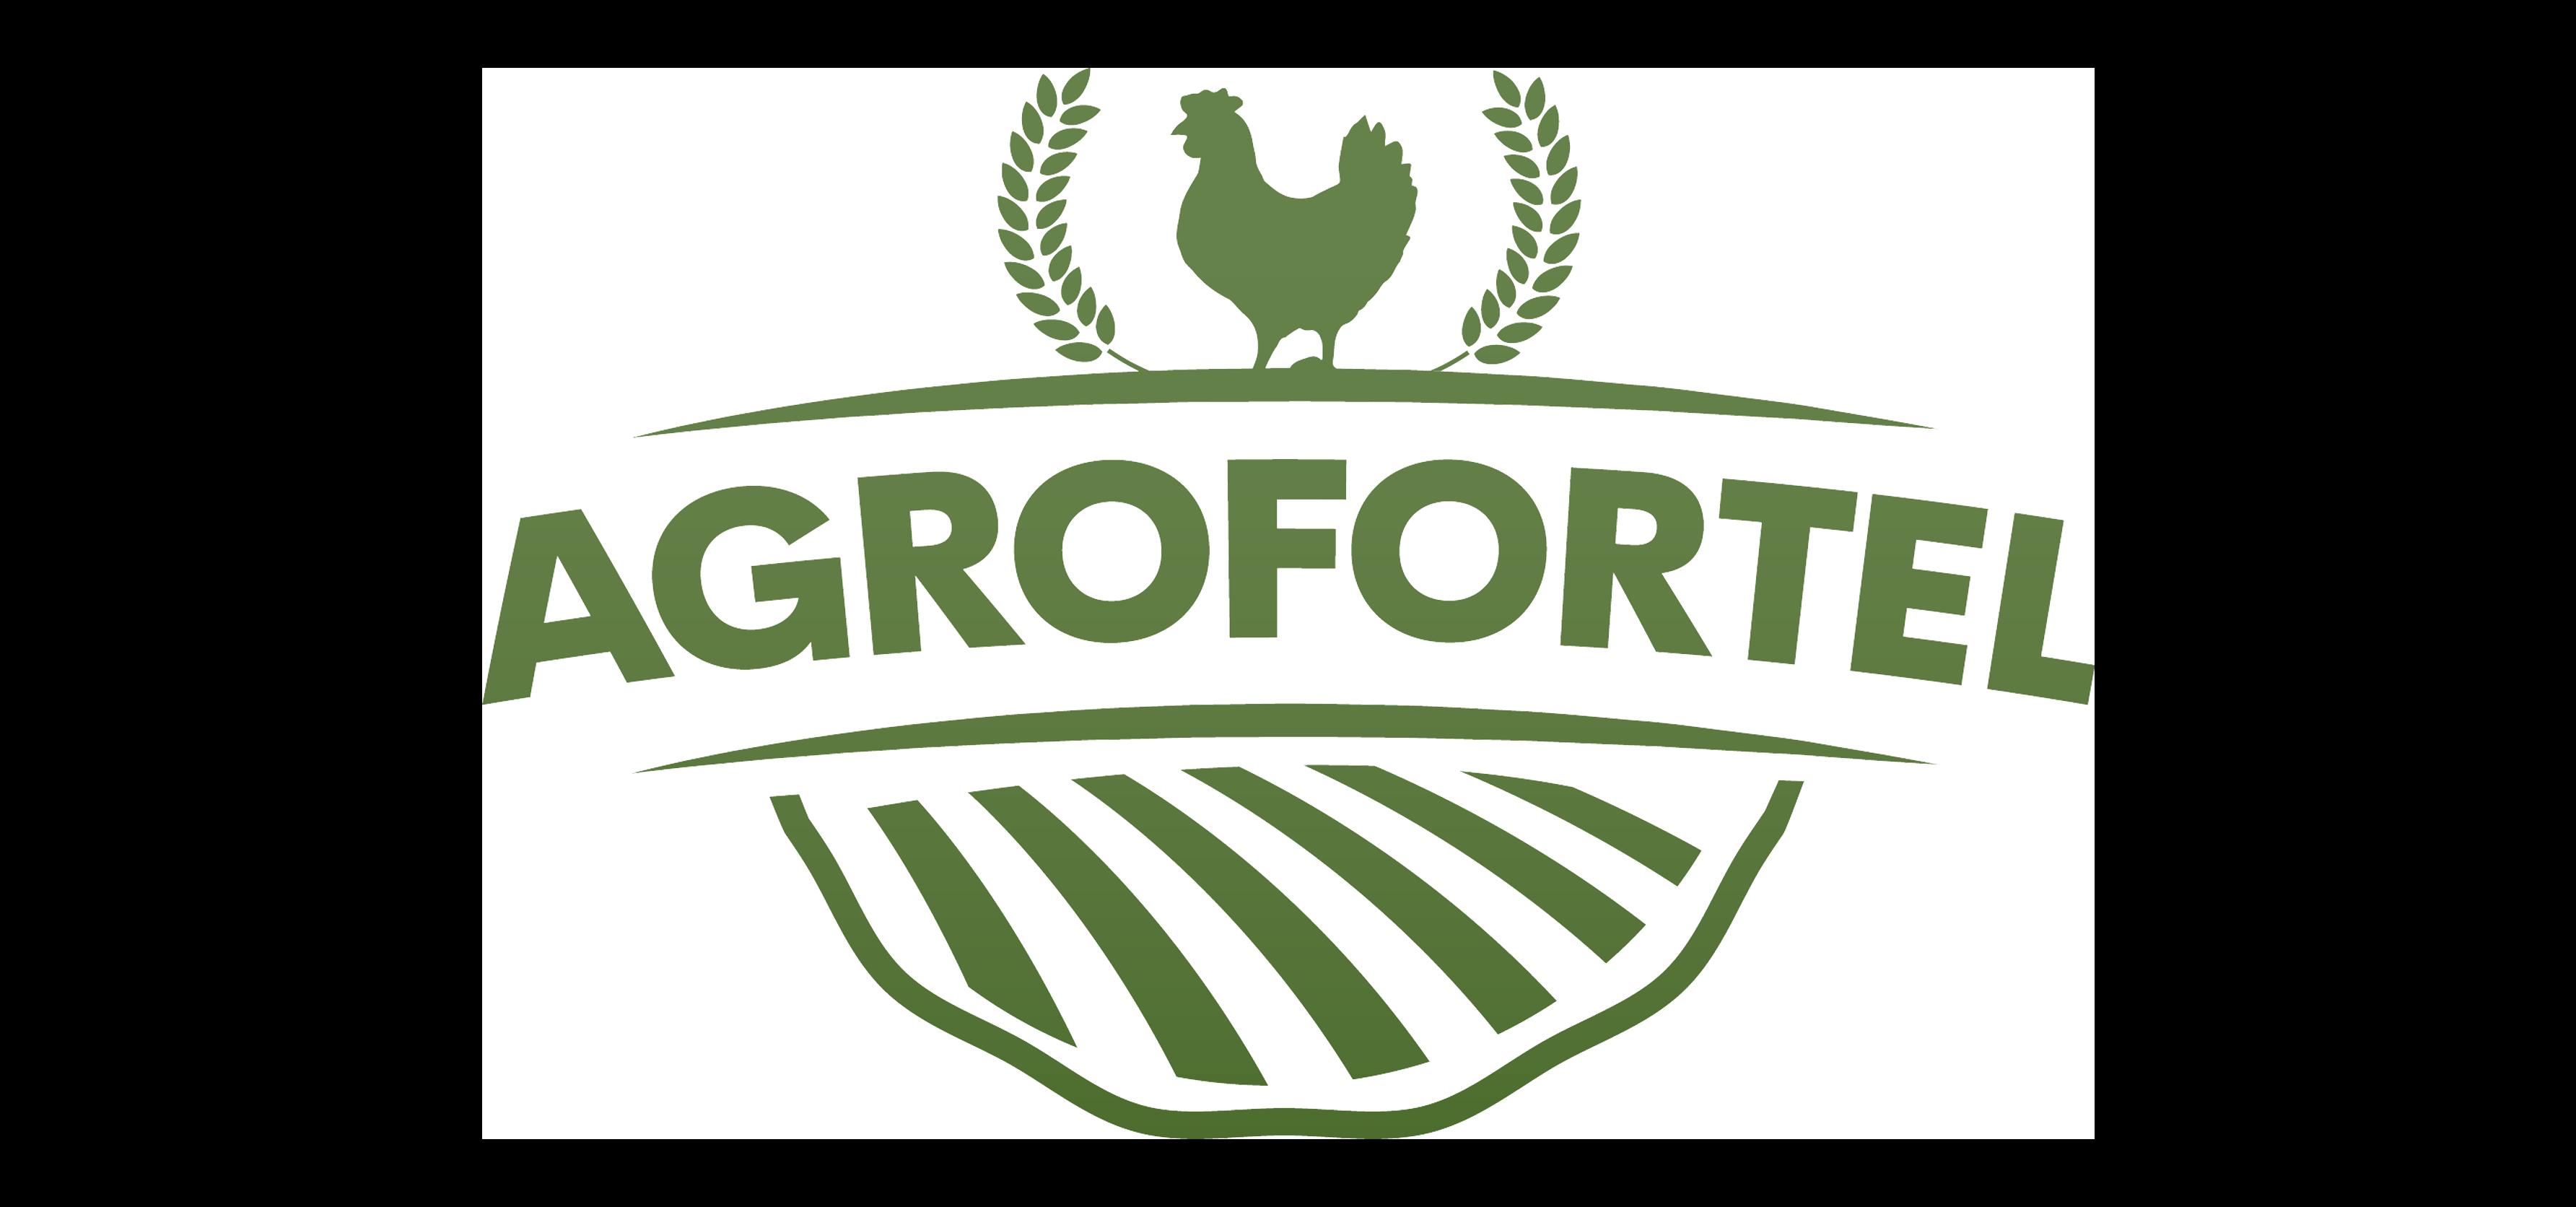 AGROFORTEL.HU